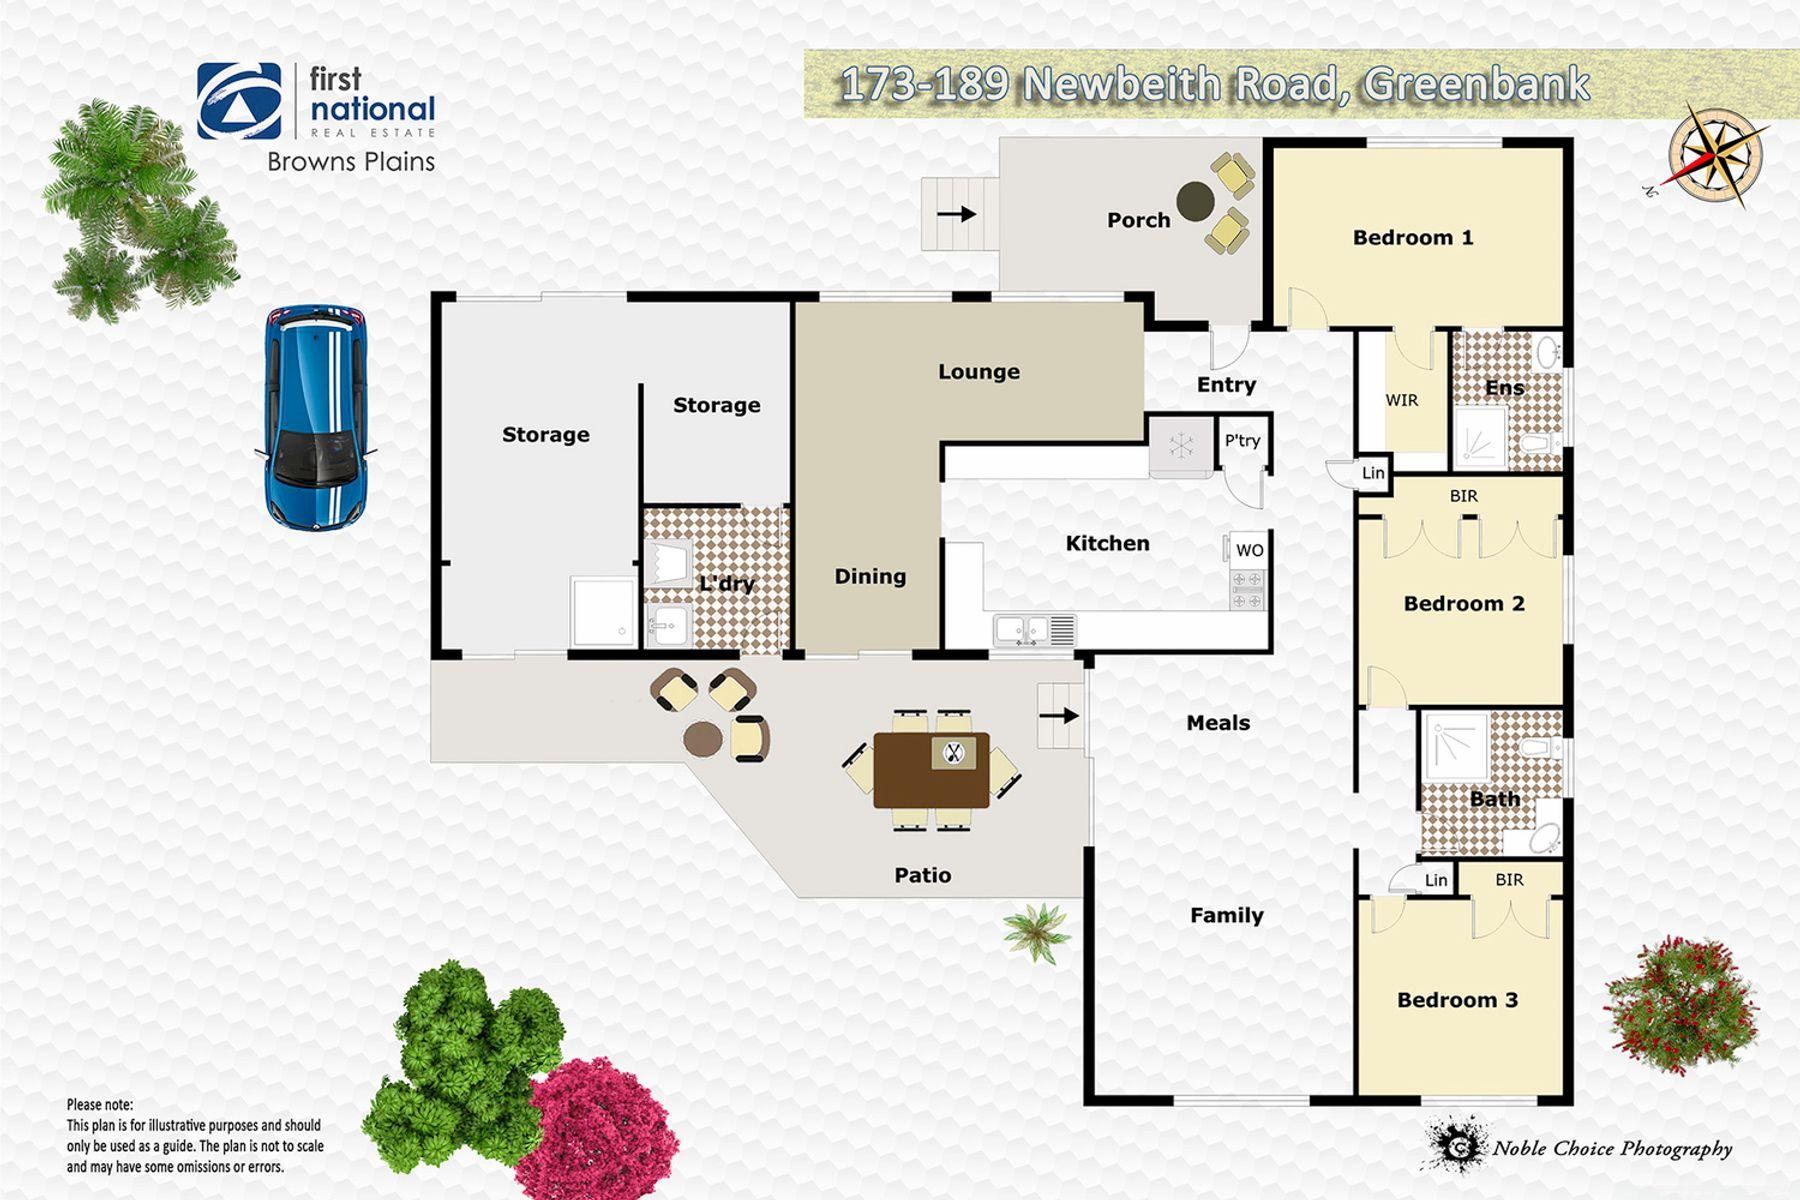 173-189 New Beith Road, Greenbank, QLD 4124